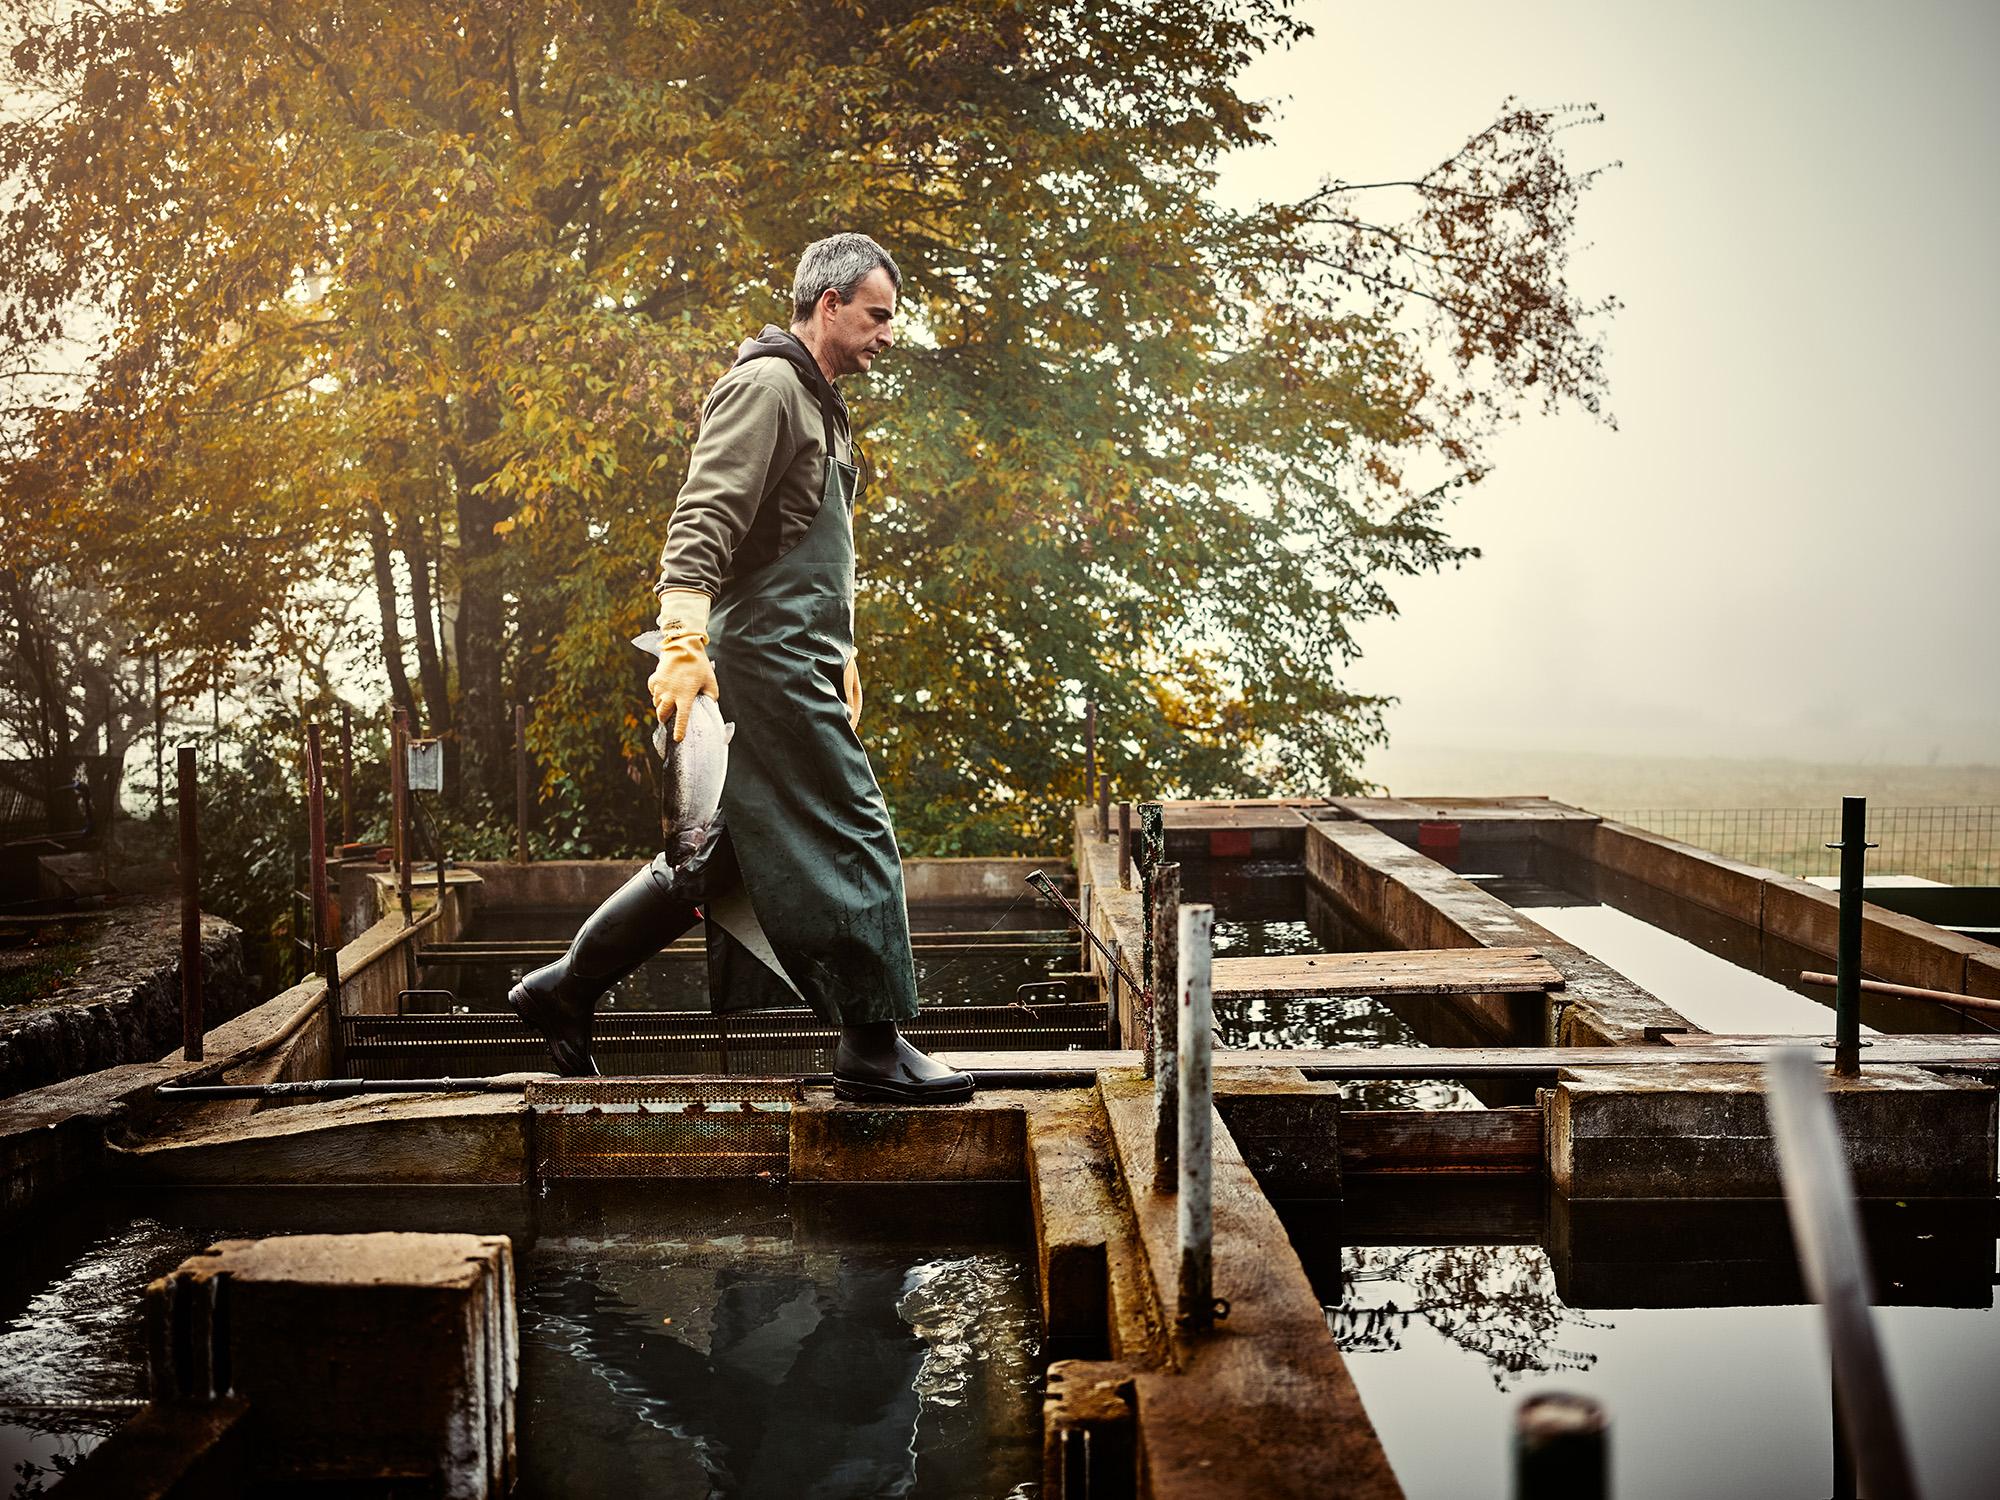 ribogojec Mitja Zupan